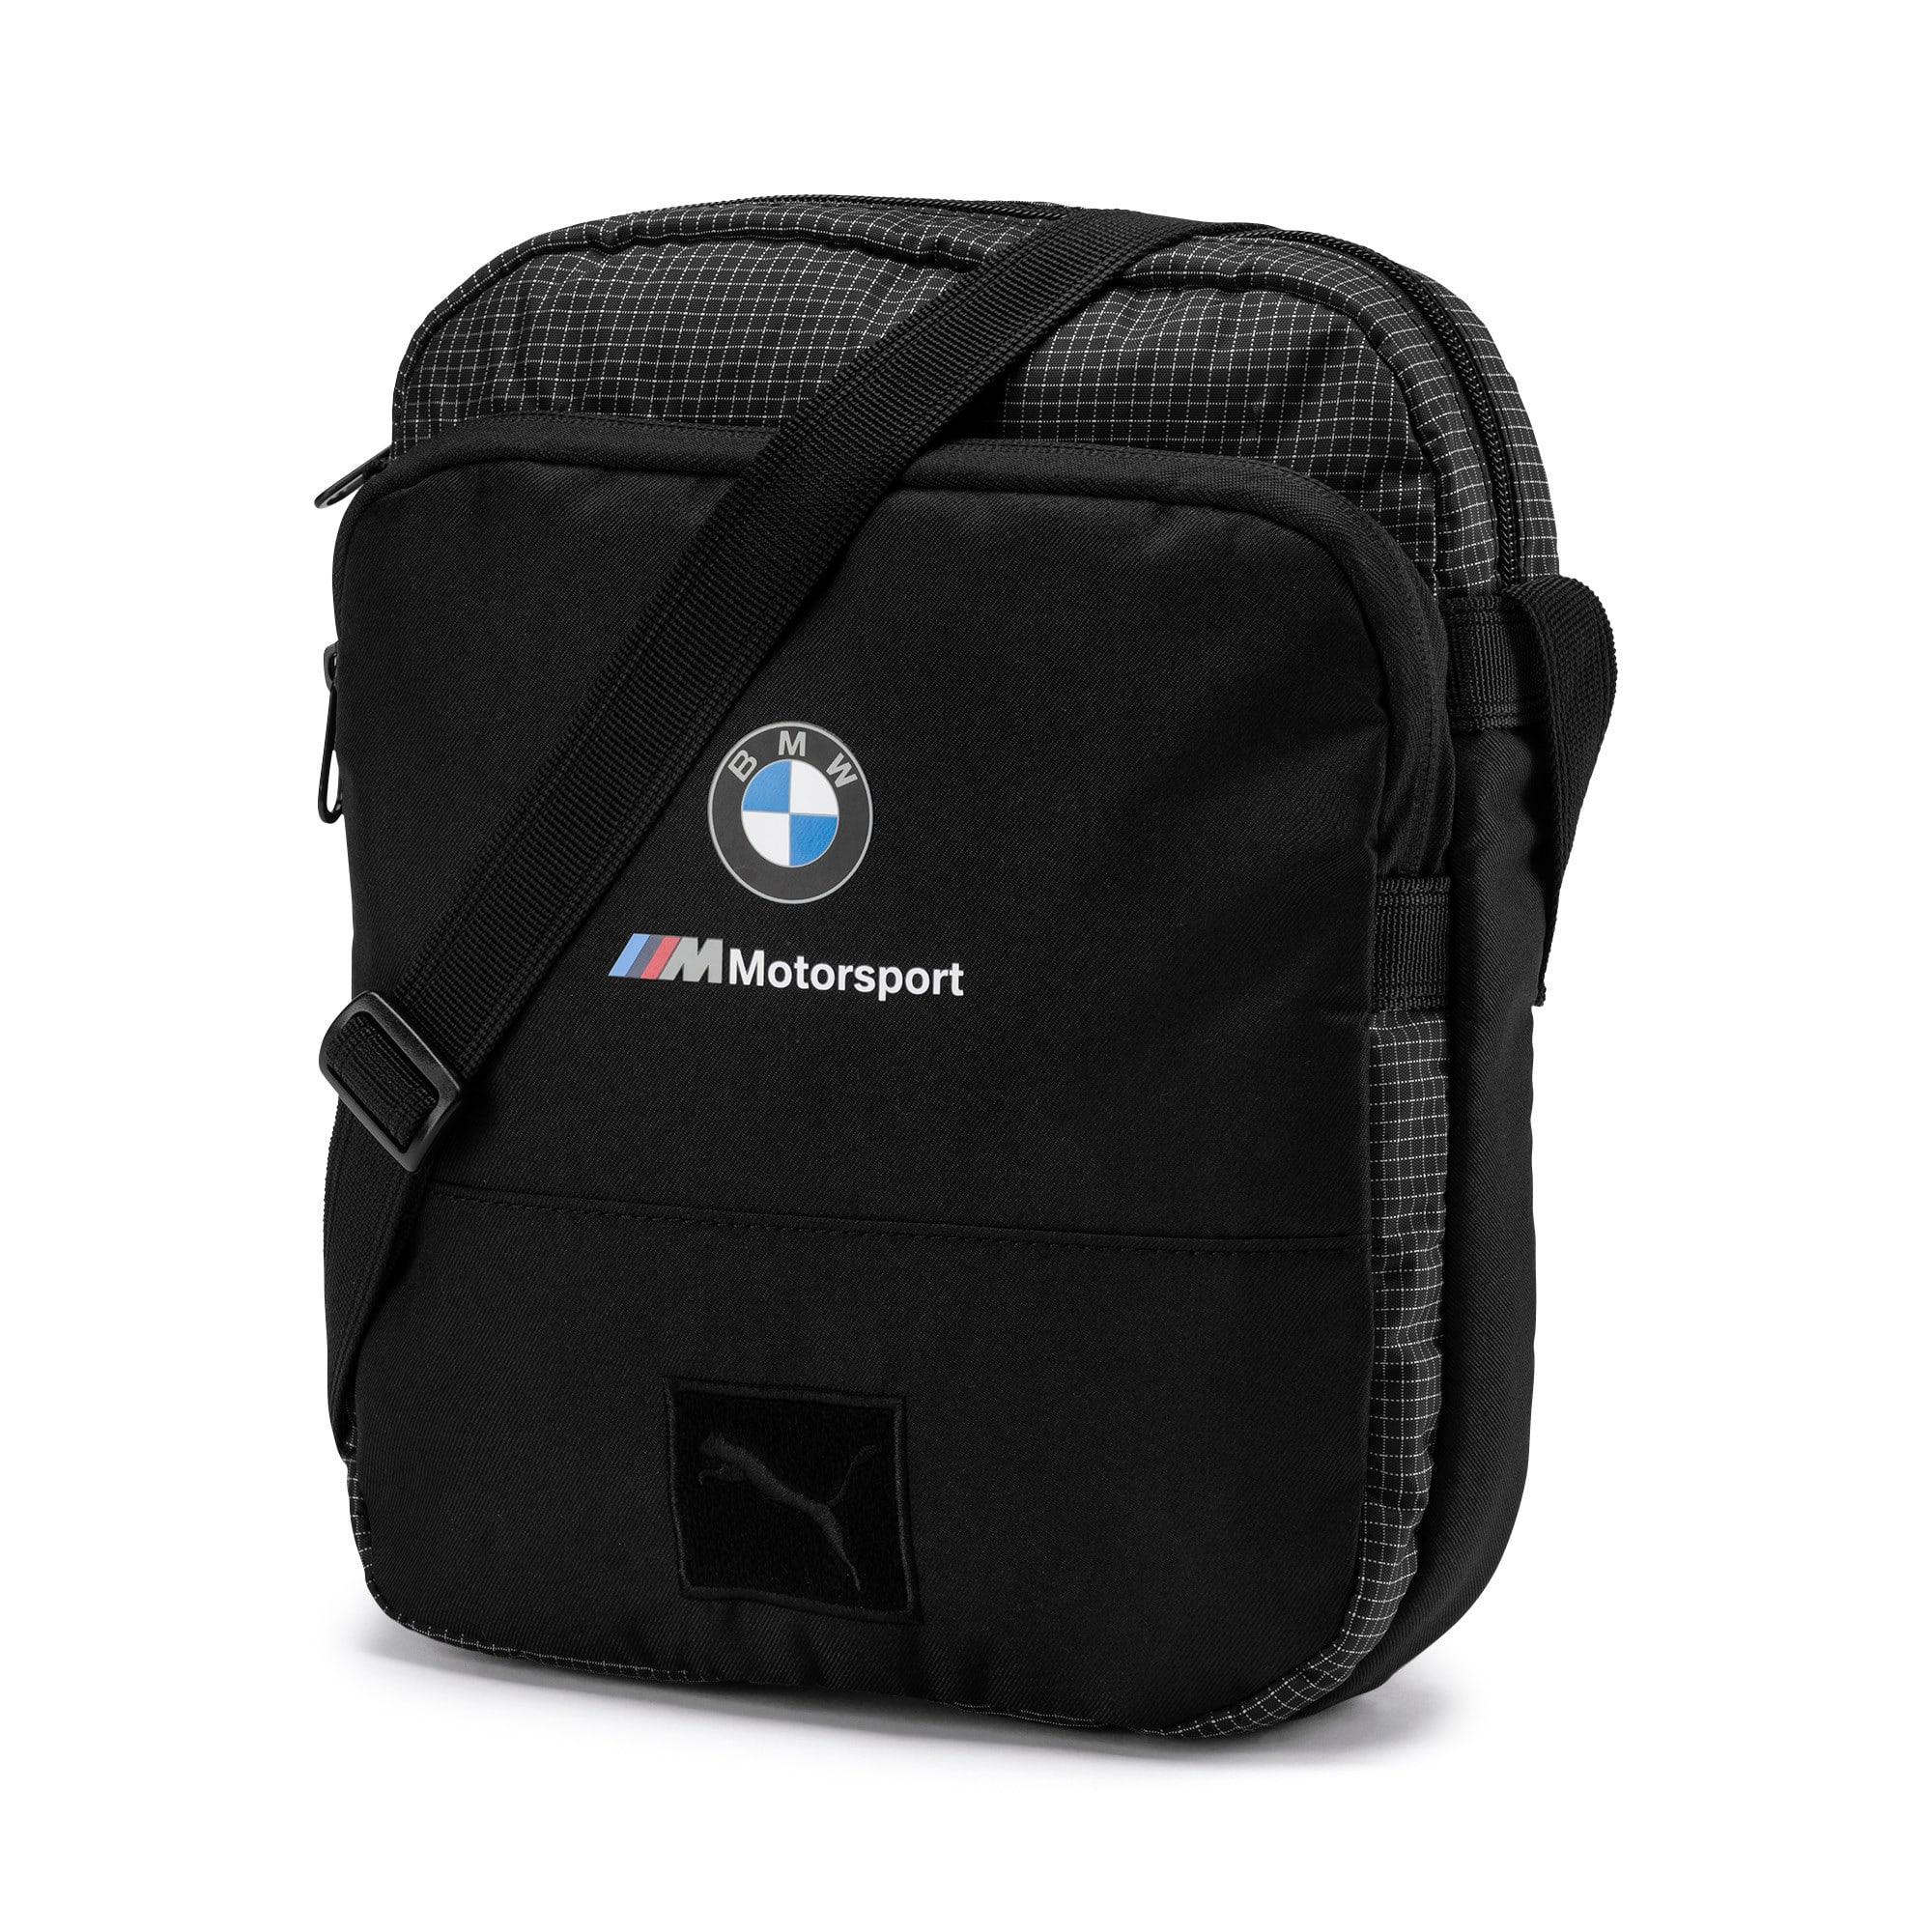 Thumbnail 1 of BMW M Motorsport Portable Bag, Puma Black, medium-IND